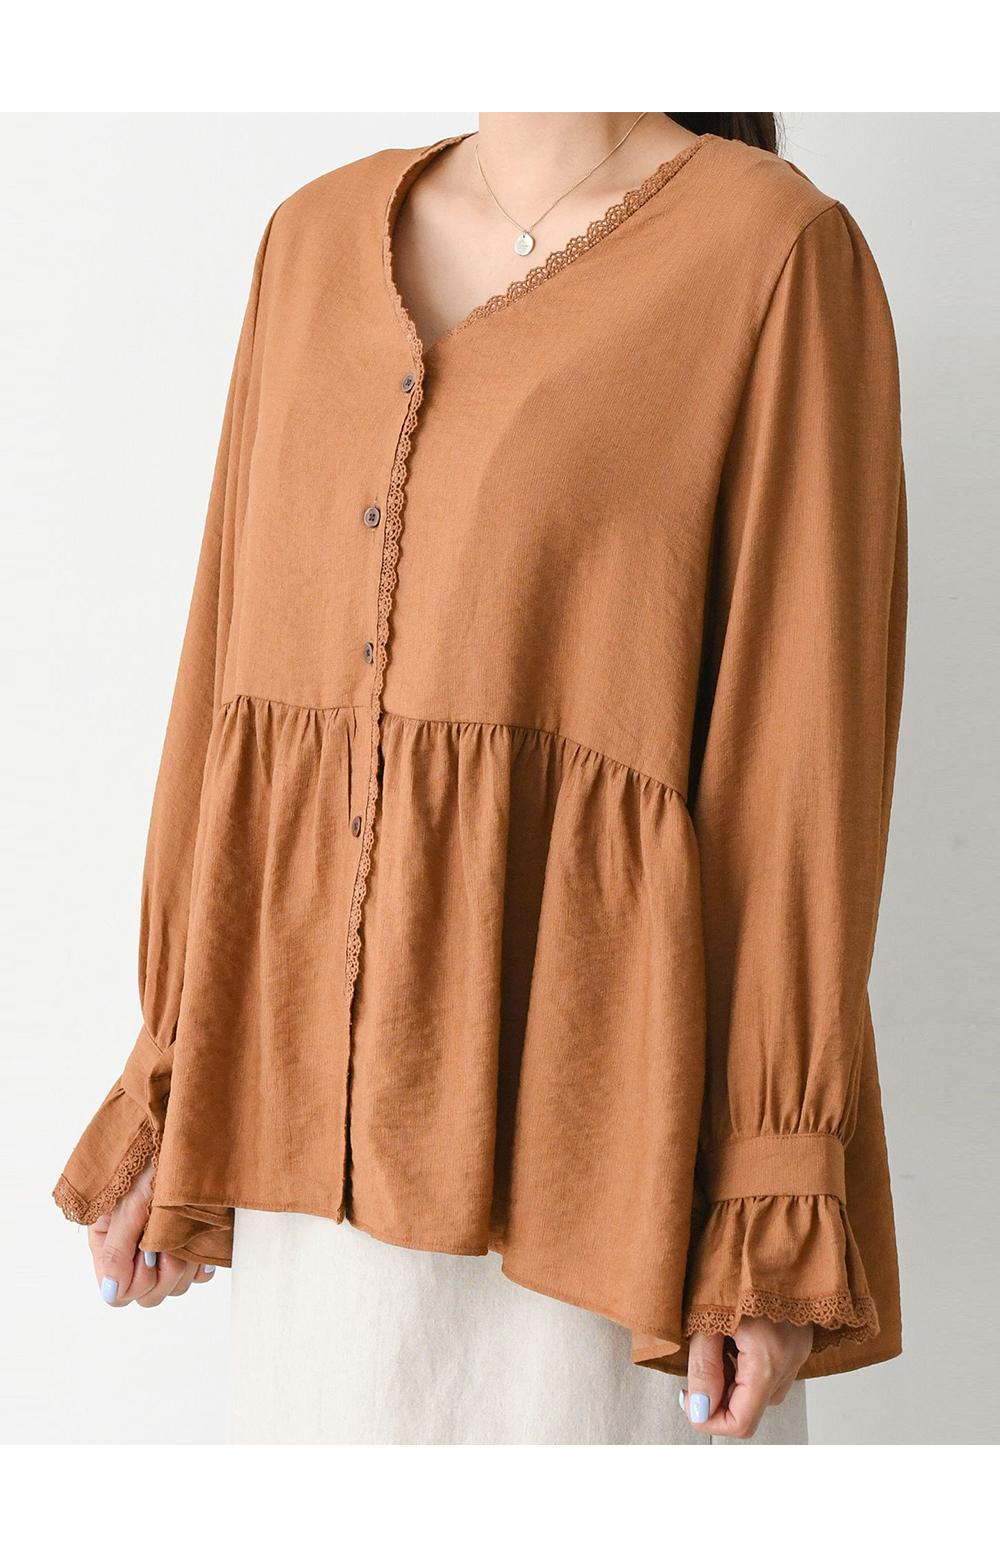 V-Neck lace puff blouse big size 66-120